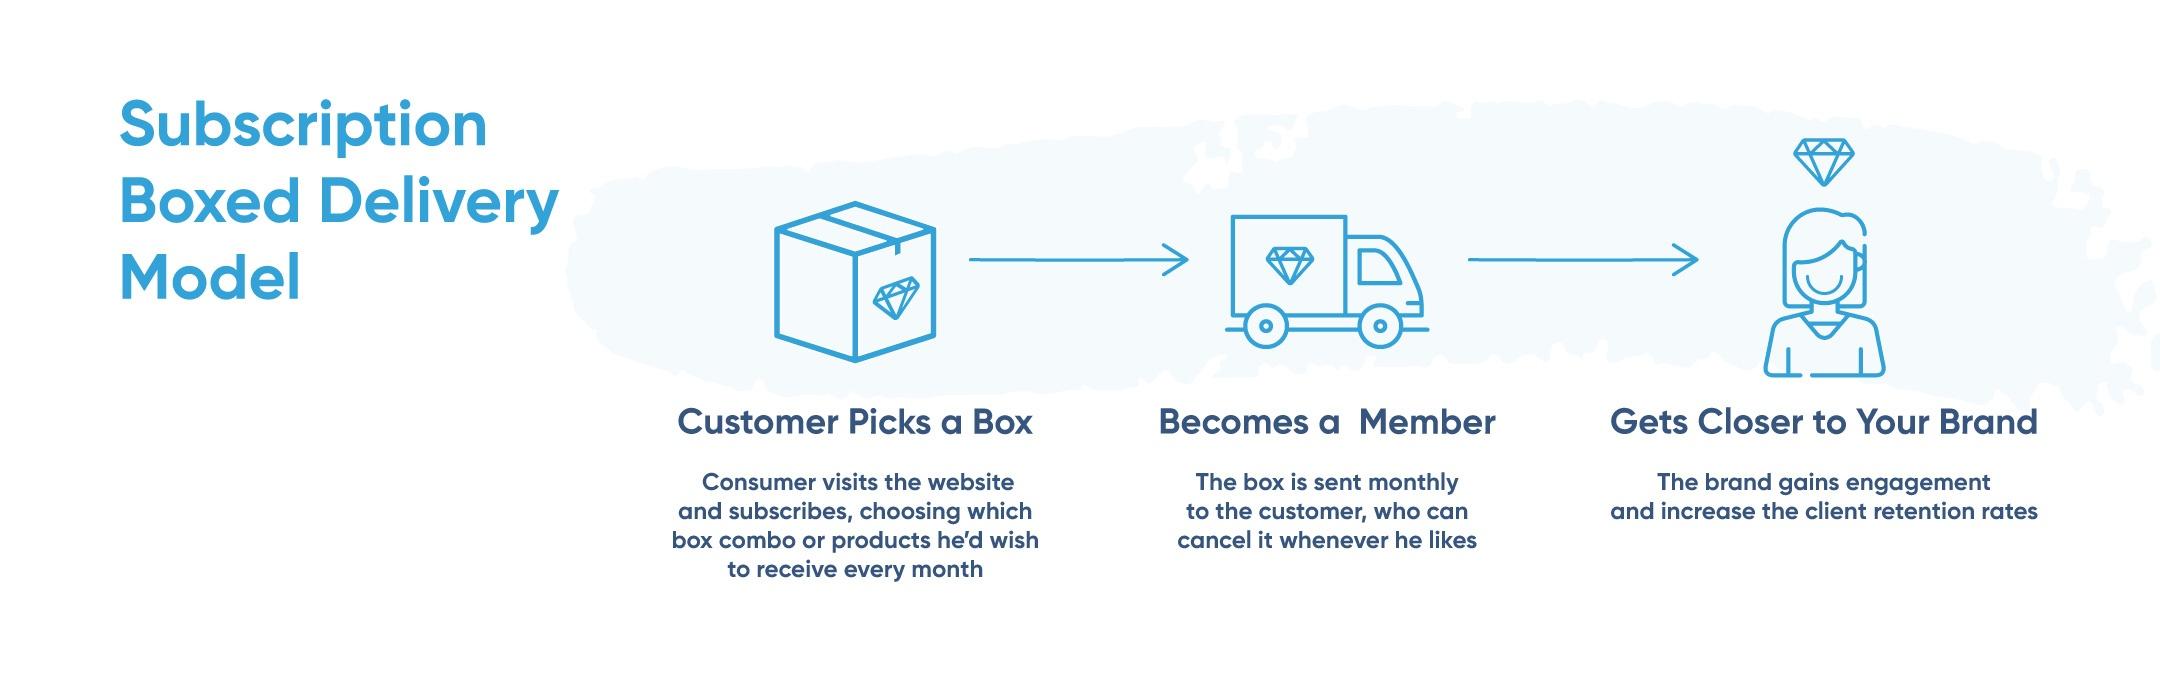 whitelabel_Ecommerce-Business-Models-DROPSHIPPING_wholesale_Merchandising_